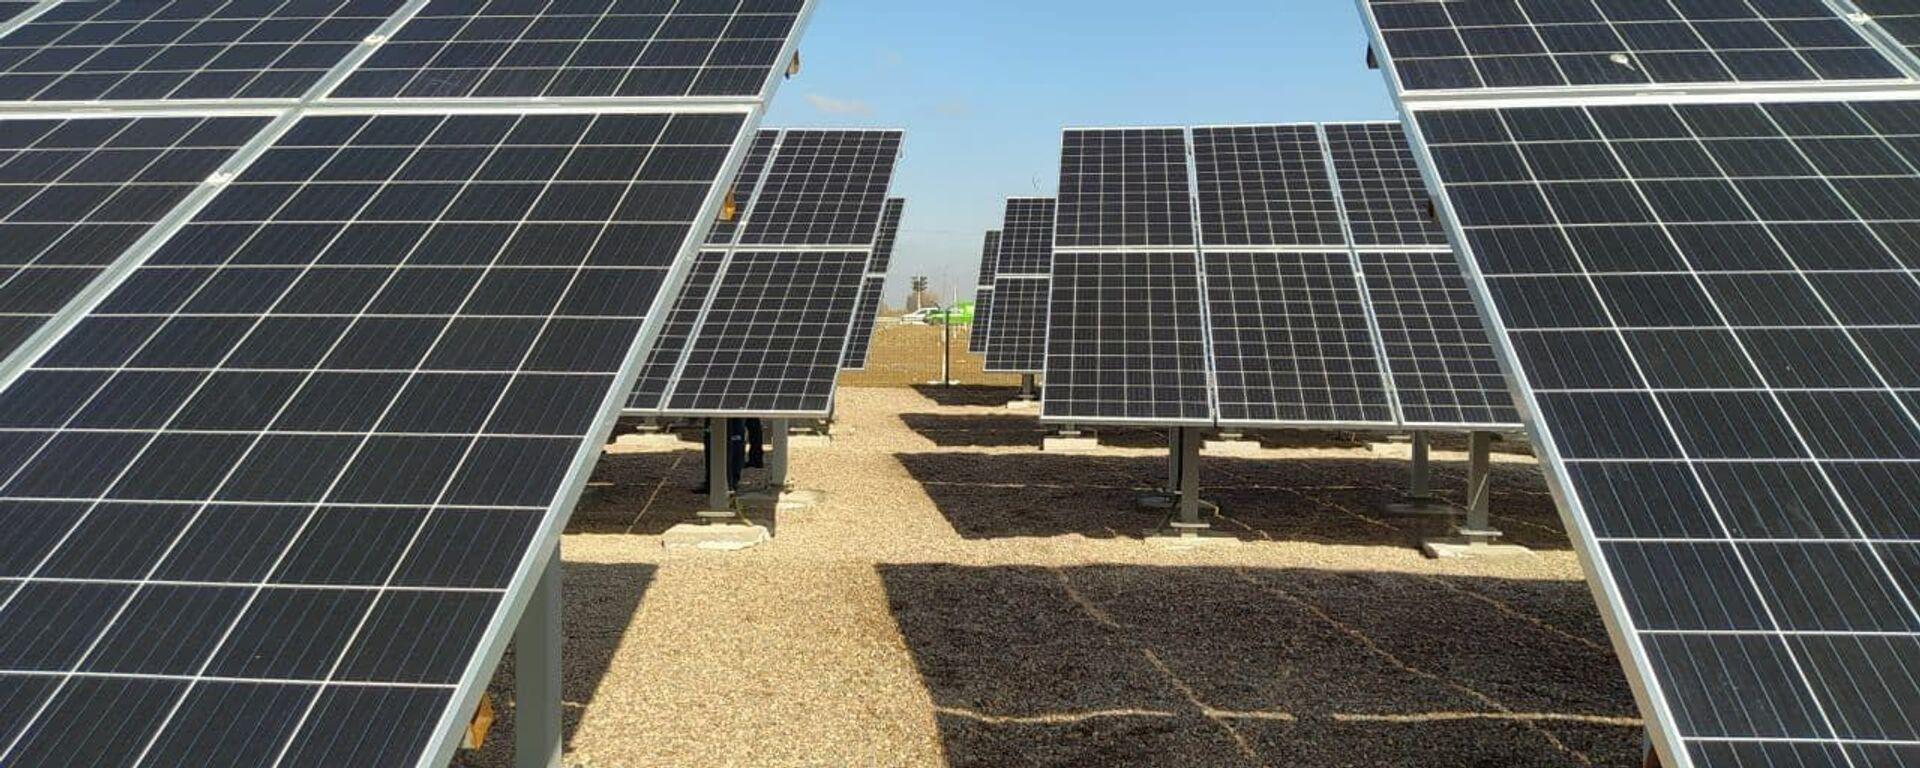 Солнечные батареи на малой ФЭС под Ташкентом - Sputnik Узбекистан, 1920, 20.05.2021